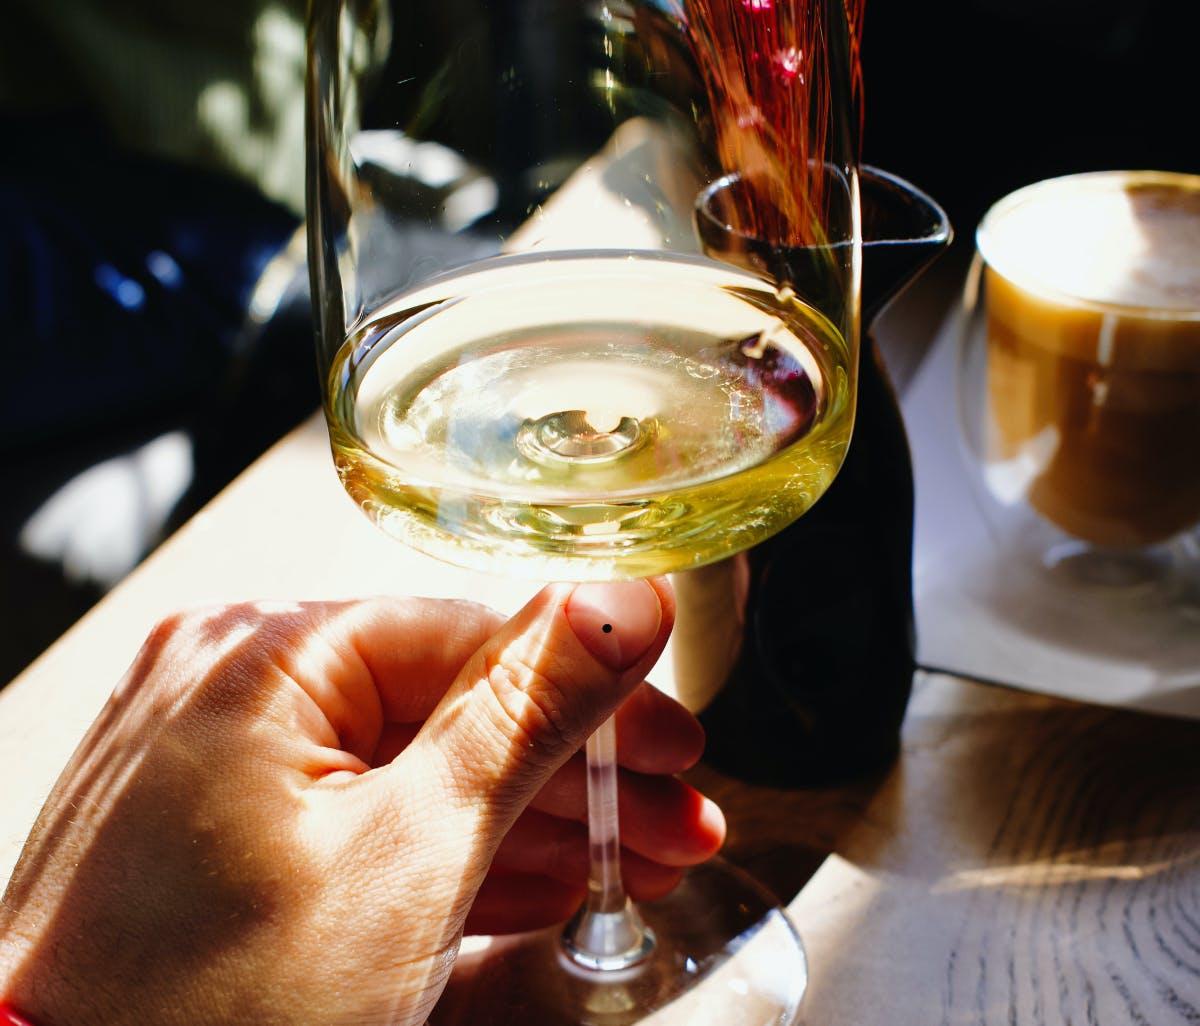 visit the wine region in tasmania